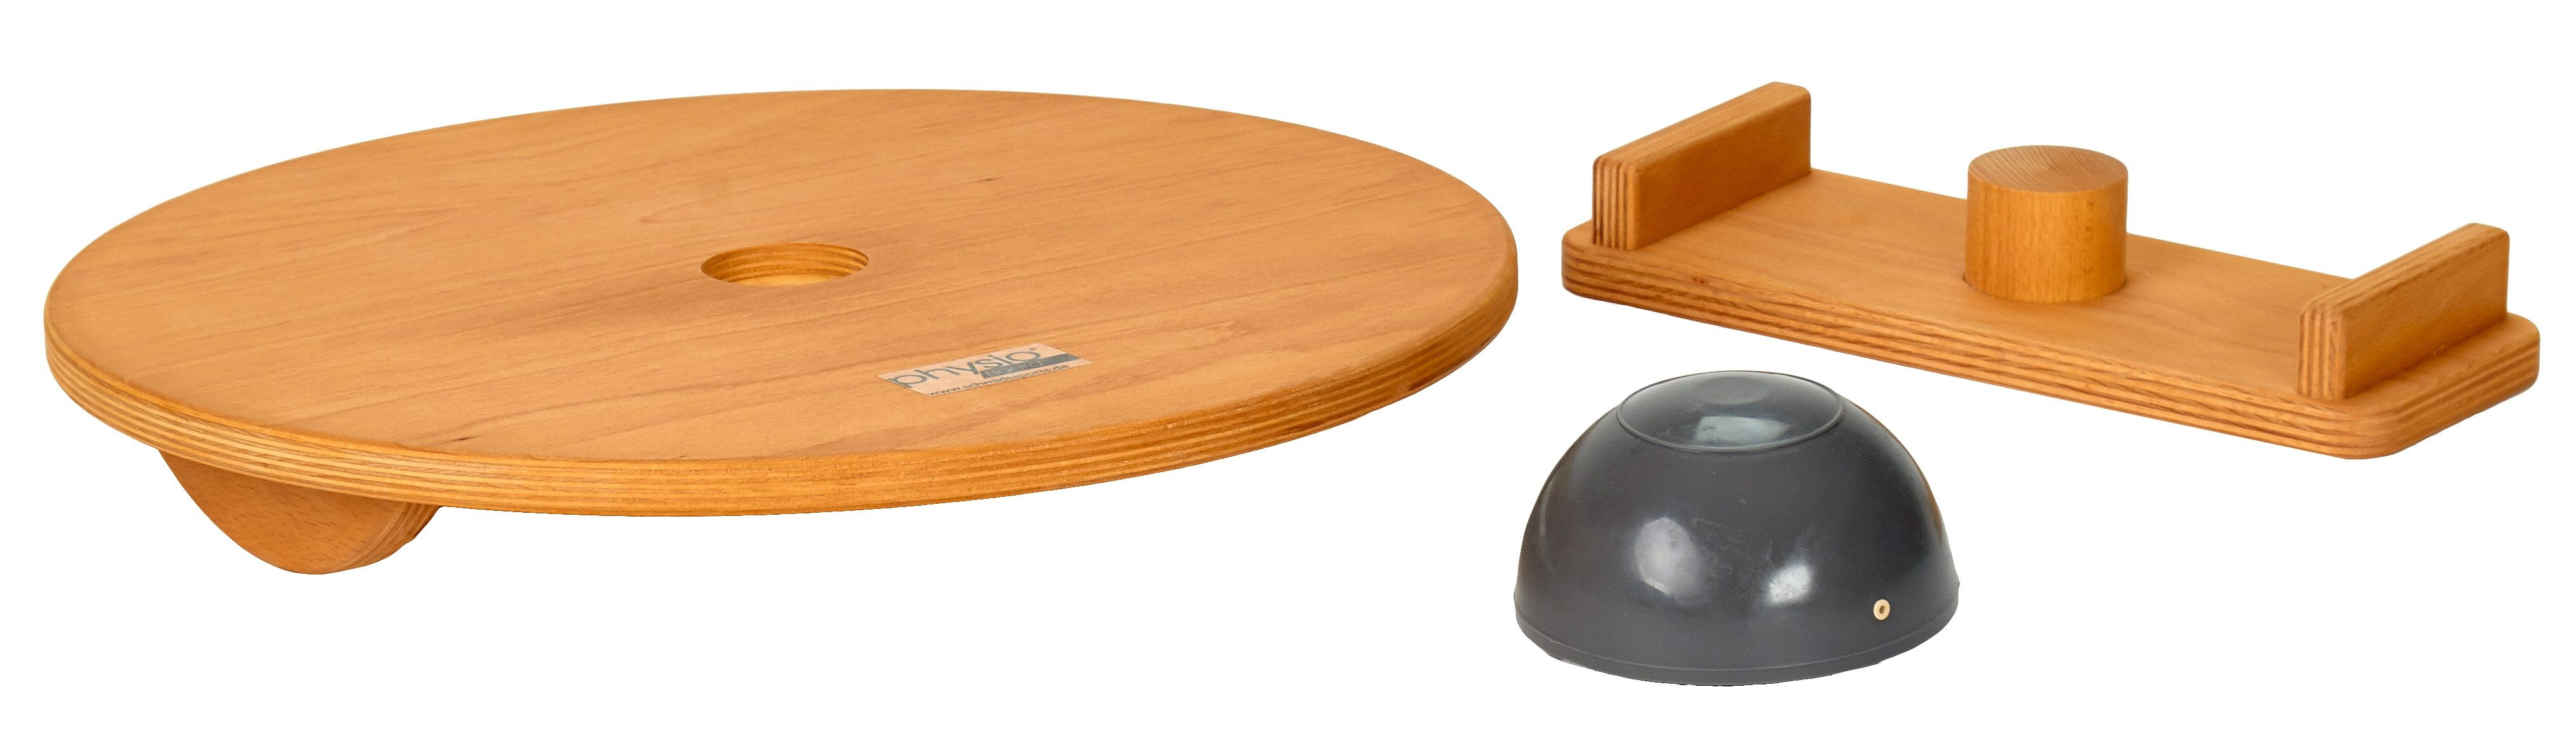 Schmidt Sports Deuser Balance Board, »Physio Board«